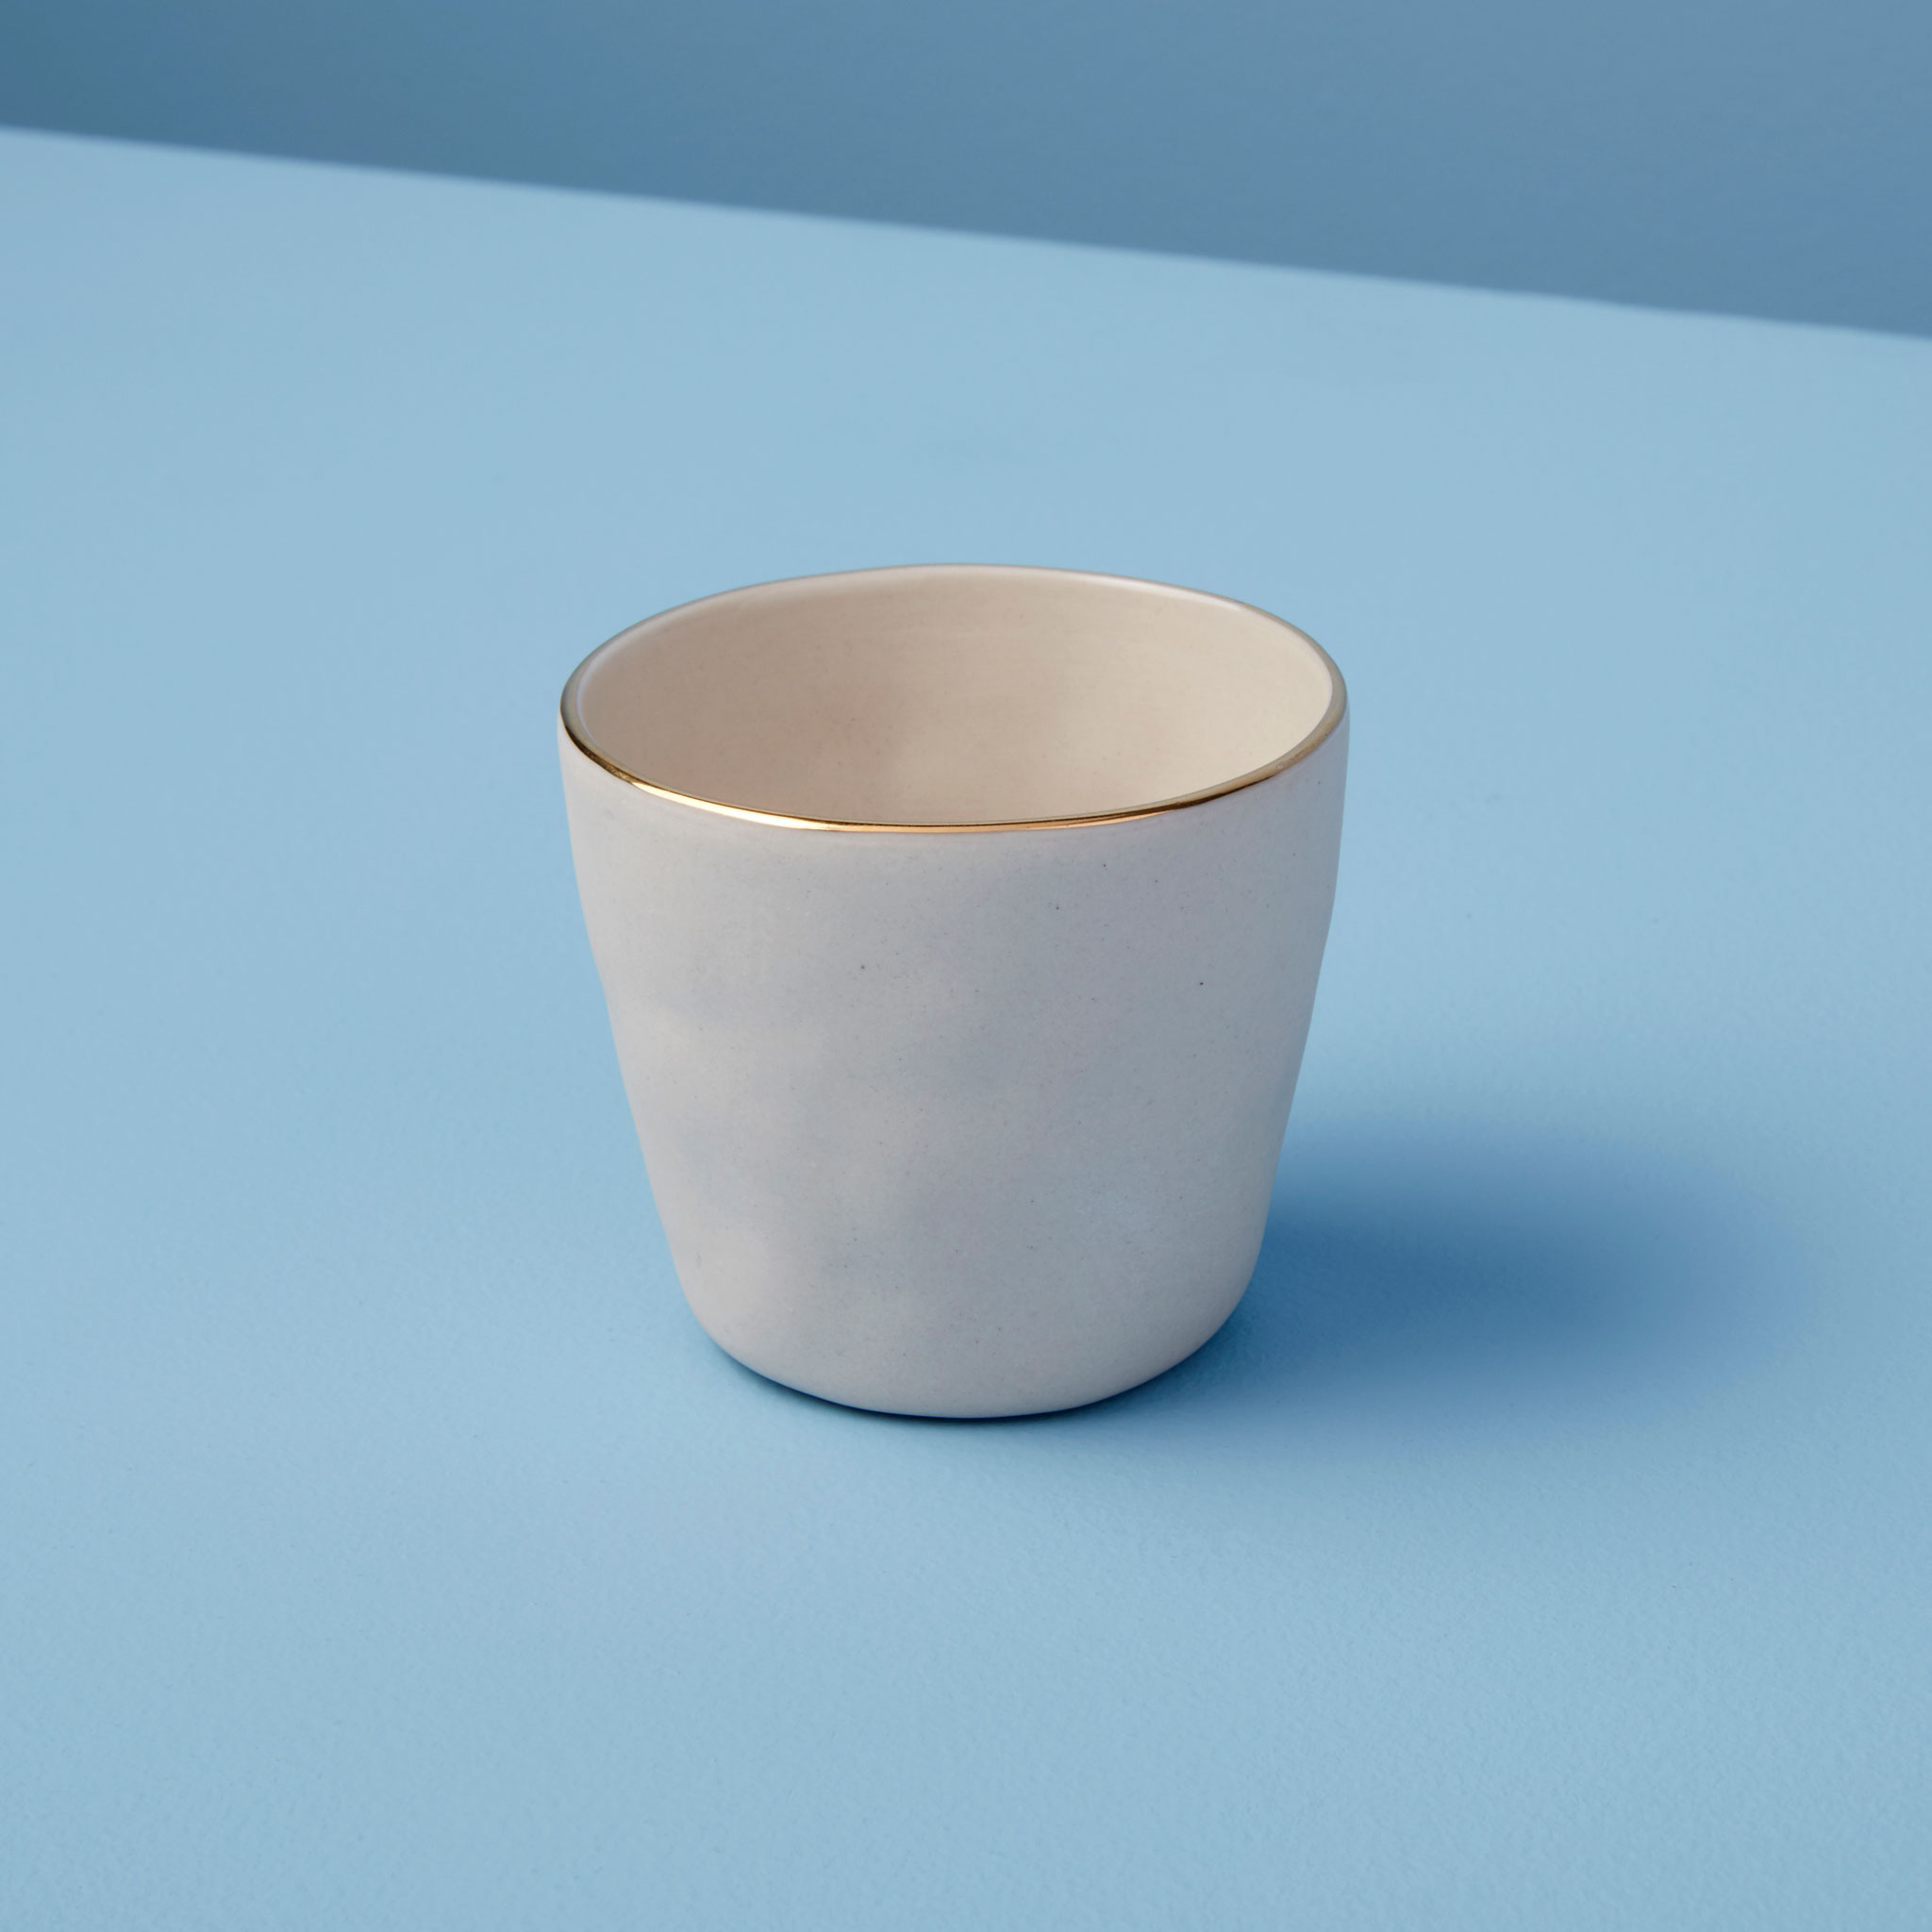 Be-Home_Gold-Rim-Stoneware-Tumbler-White-Mini_64-744